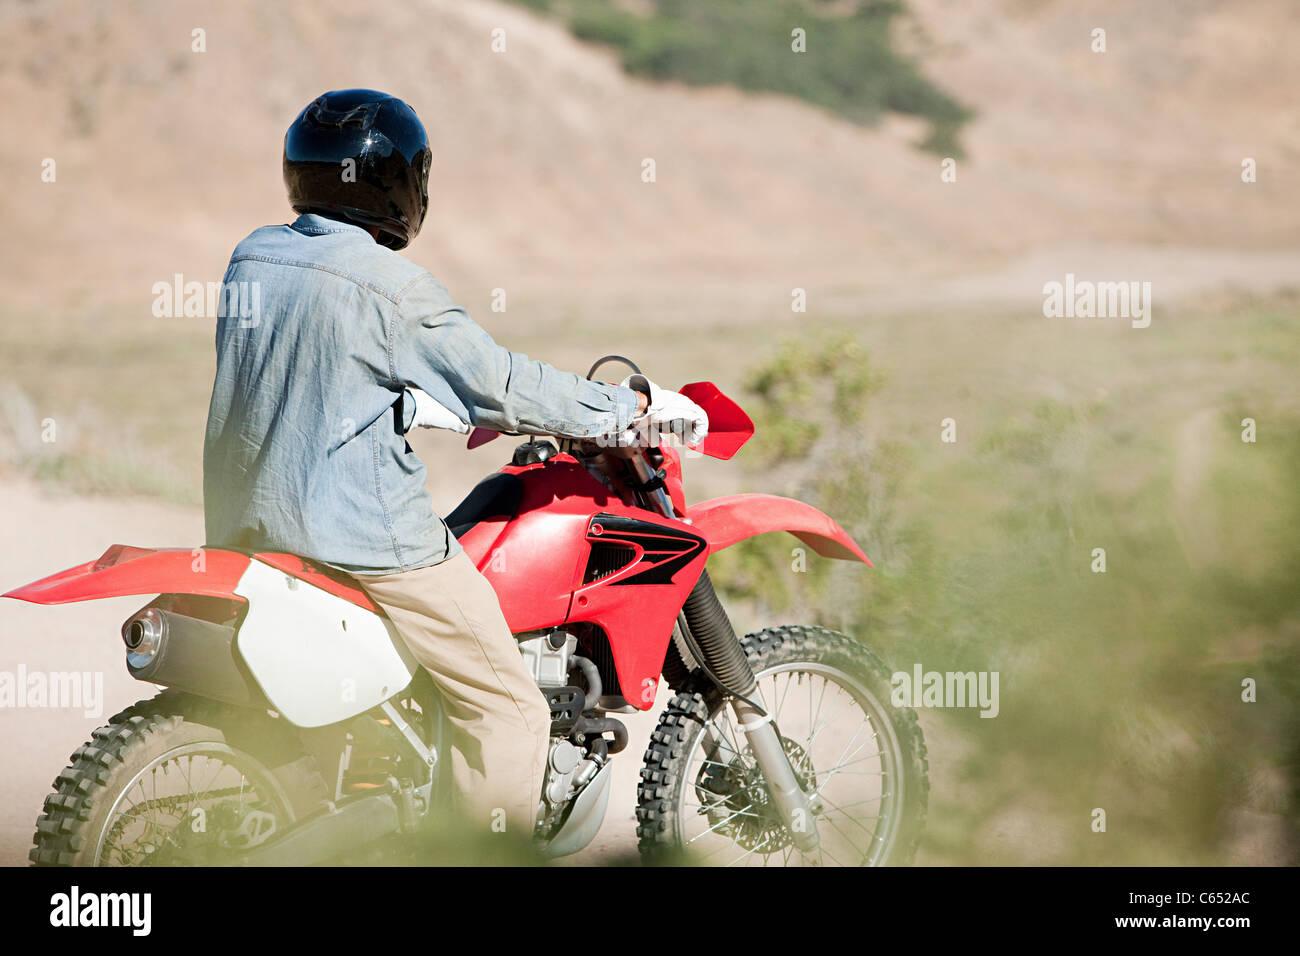 Man riding dirt bike - Stock Image